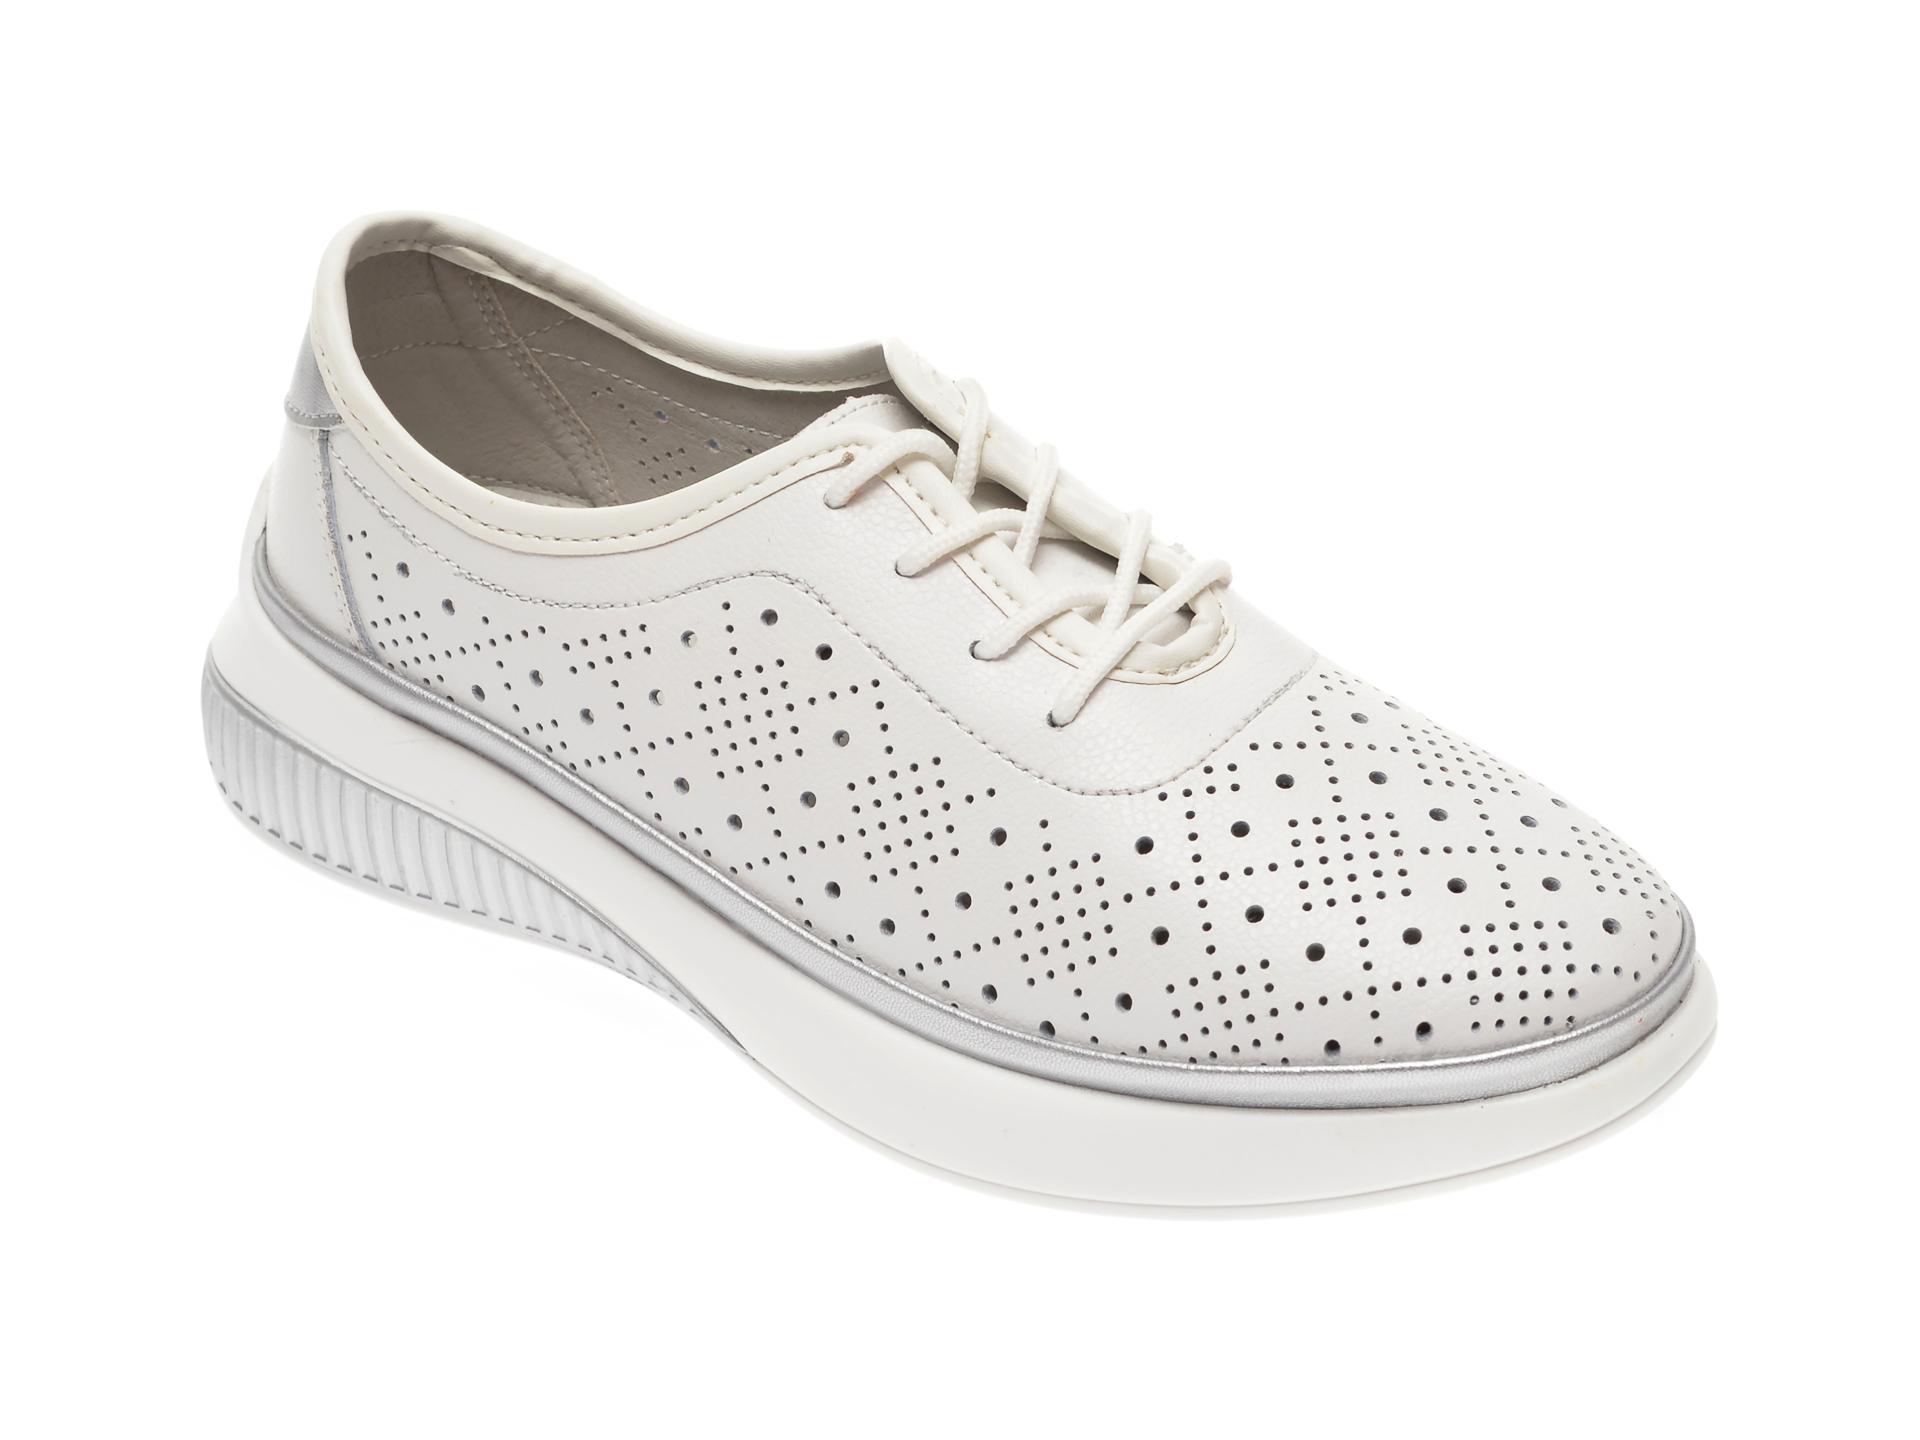 Pantofi IMAGE albi, 807, din piele naturala imagine